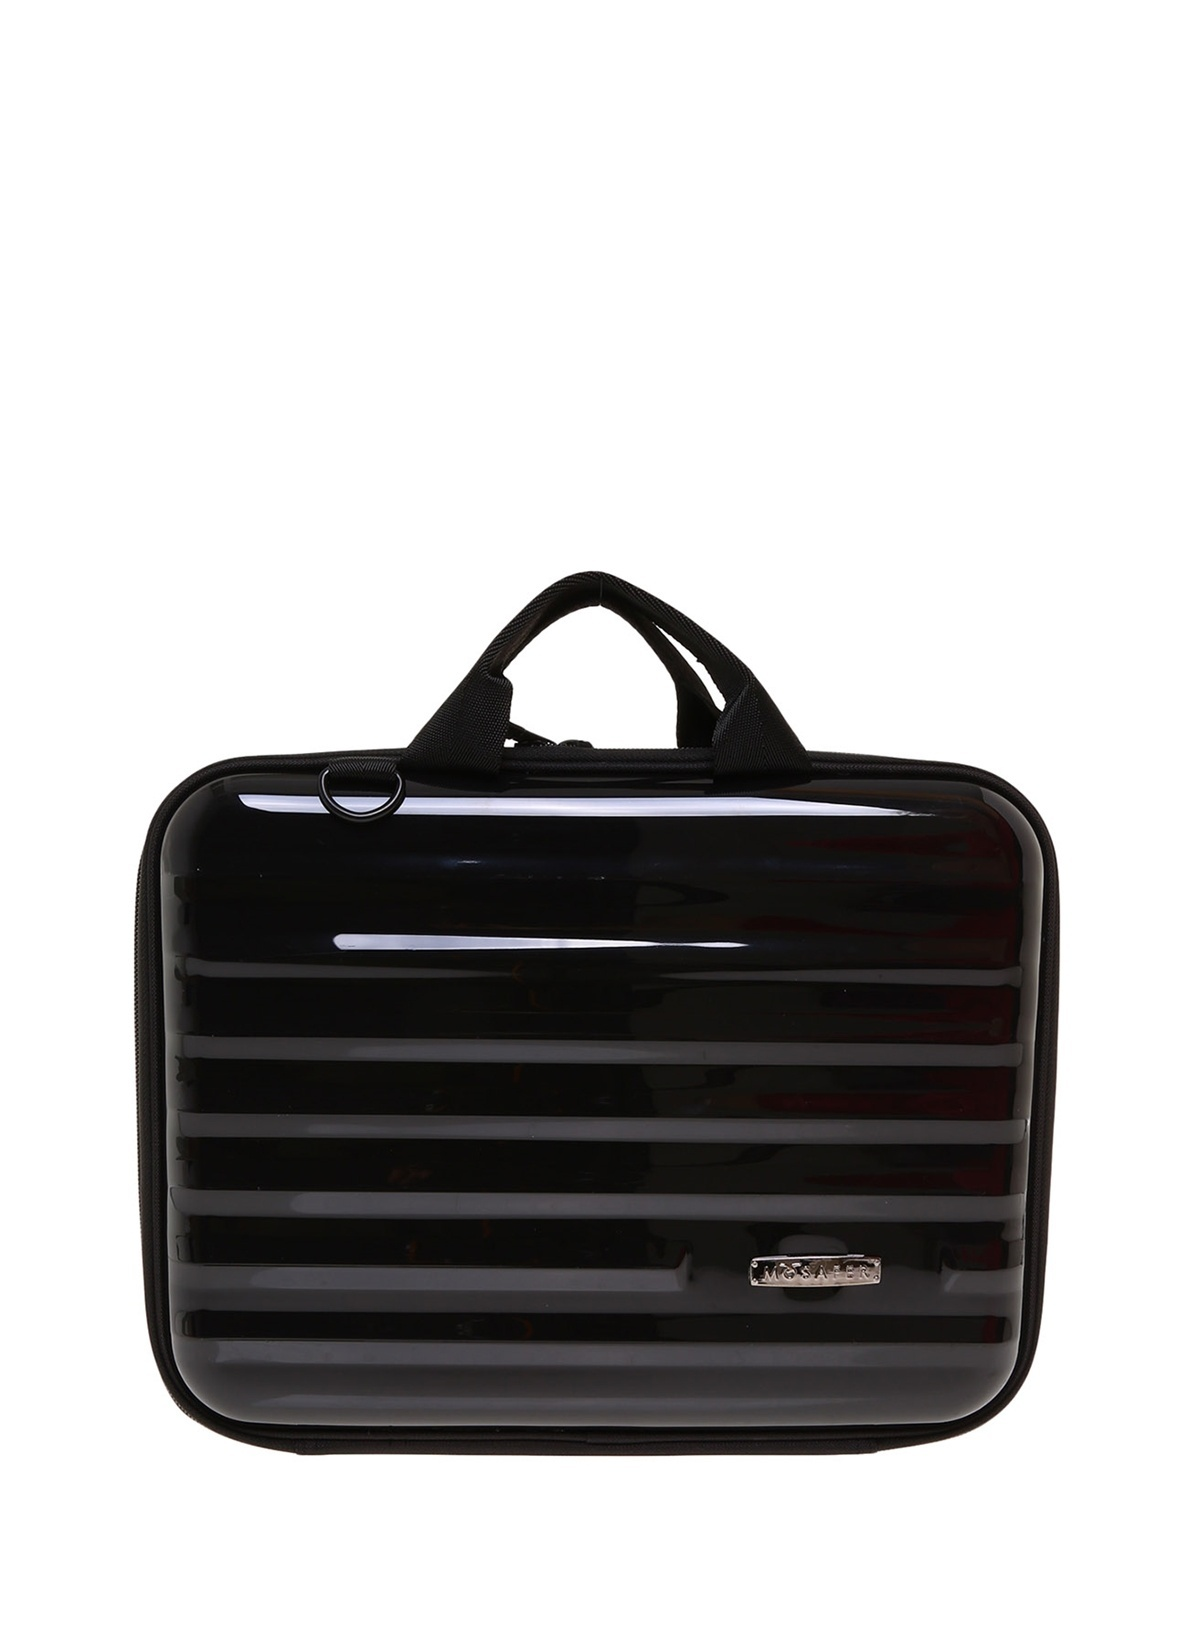 Mosafer Laptop – Evrak Çantası Mosafer-evrak-Çantası – 299.0 TL